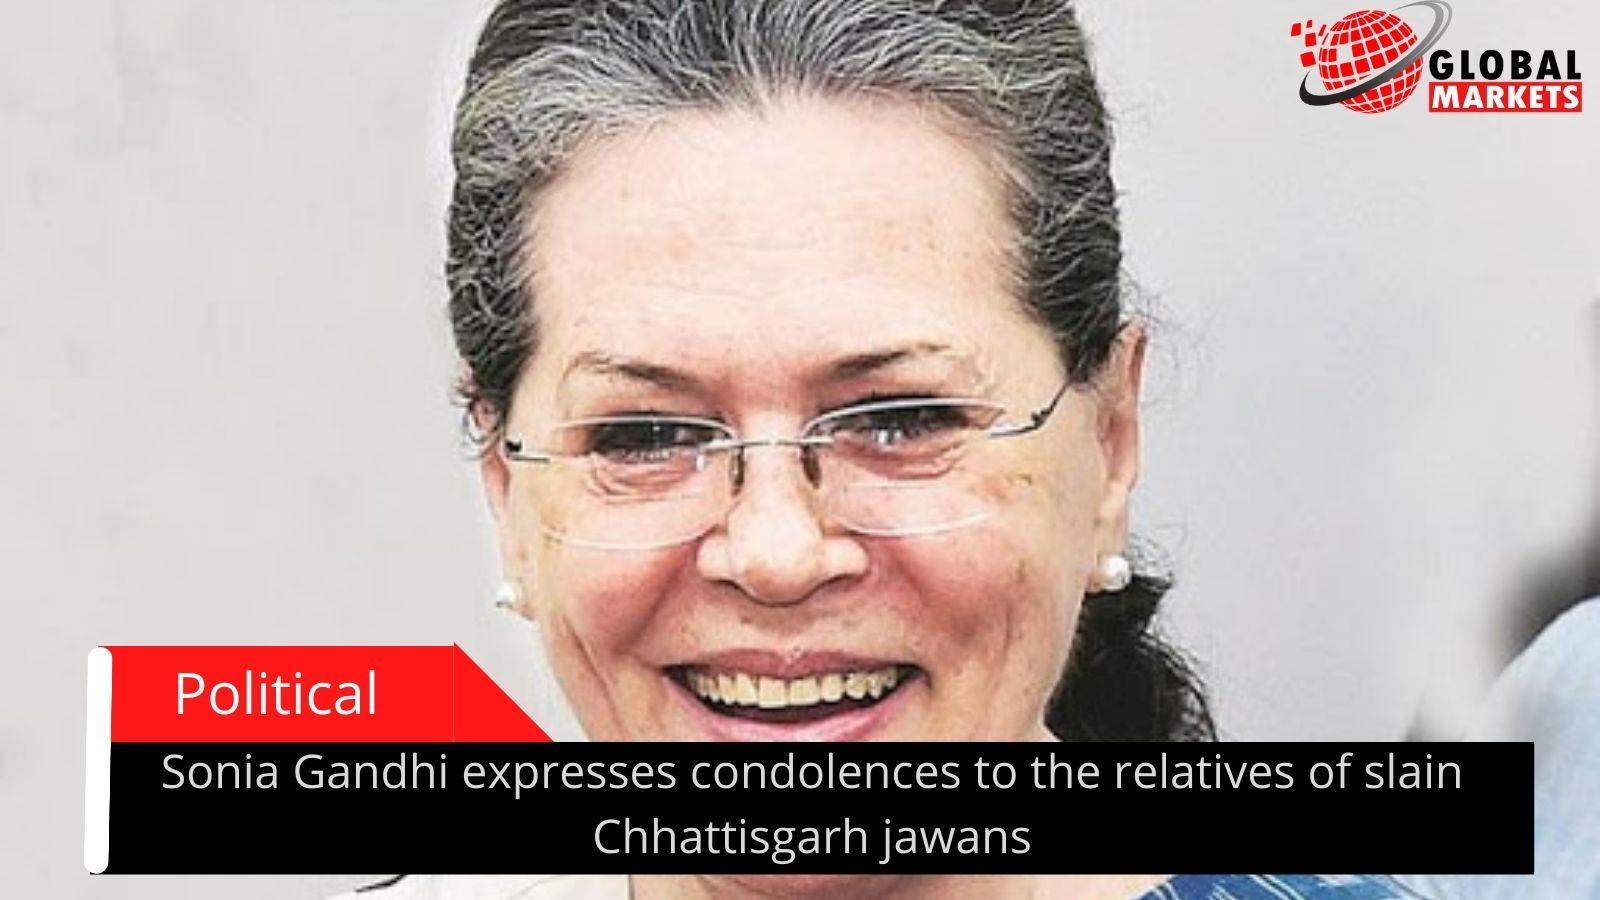 Sonia Gandhi expresses condolences to the relatives of slain Chhattisgarh jawans